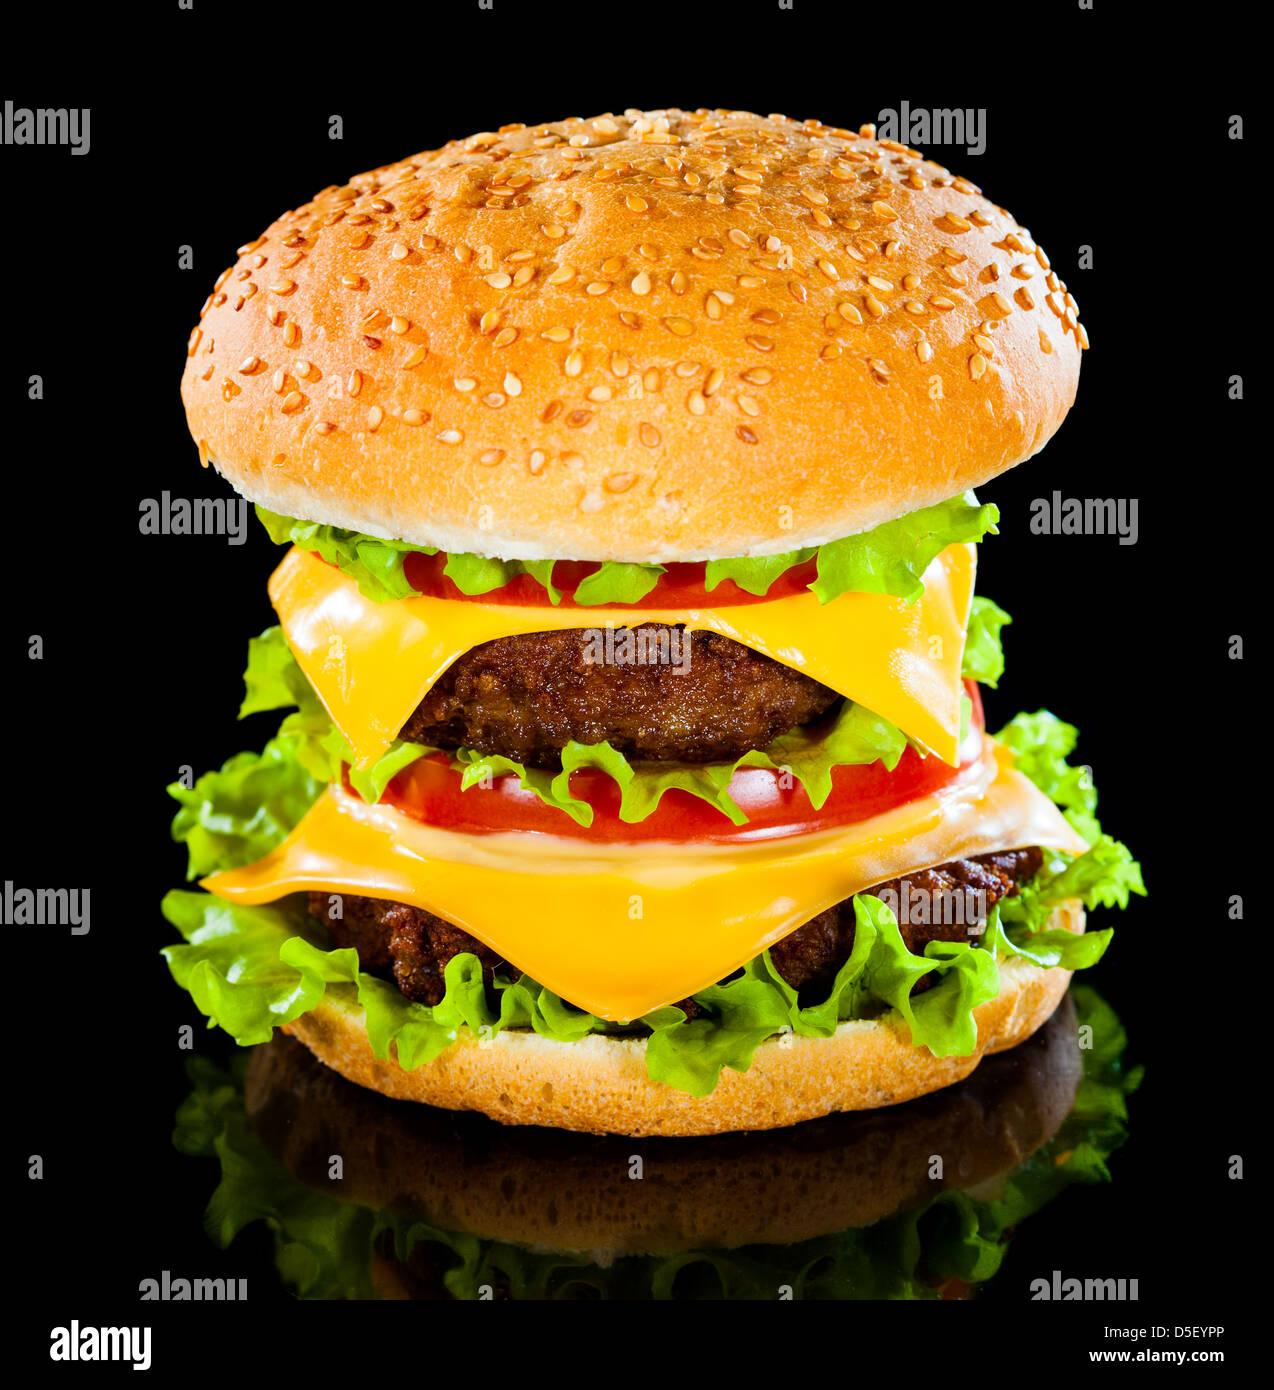 Tasty and appetizing hamburger on a darkly background - Stock Image